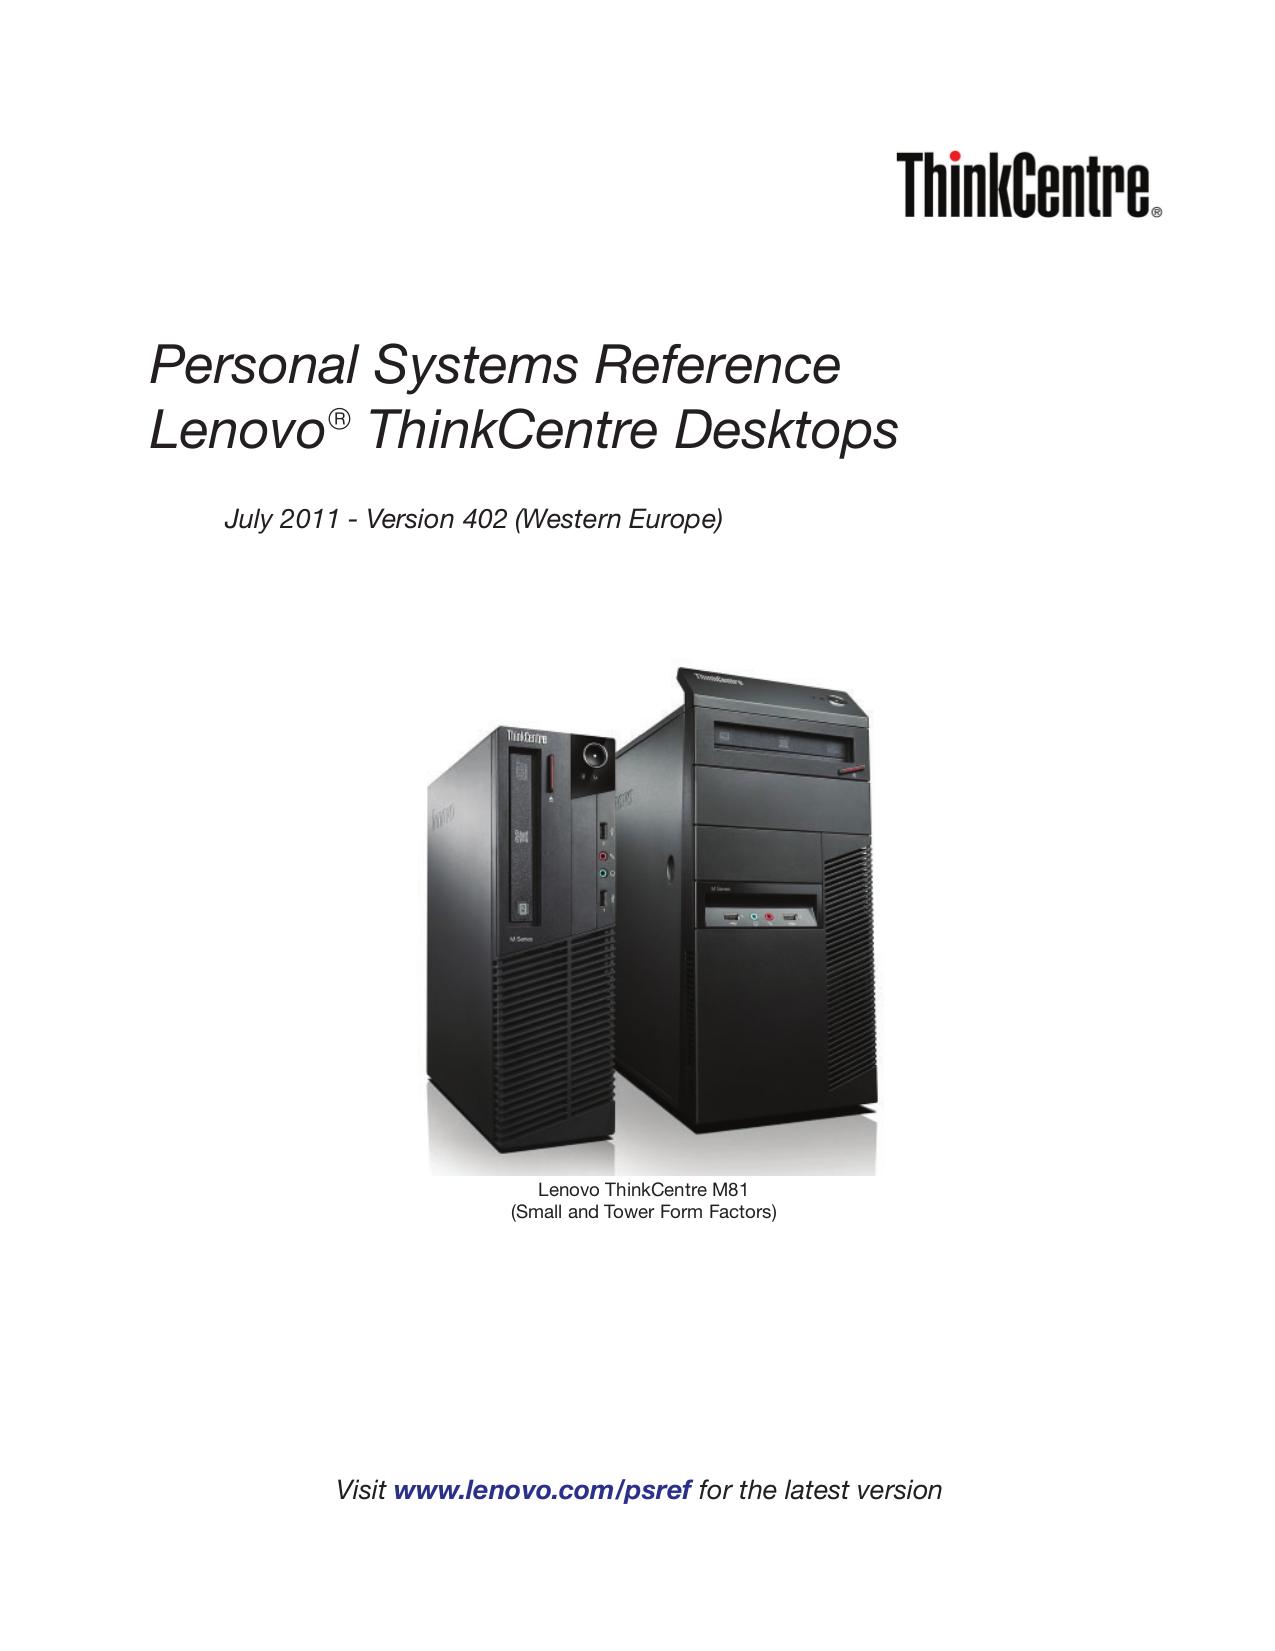 pdf for Lenovo Desktop ThinkCentre M81 5048 manual